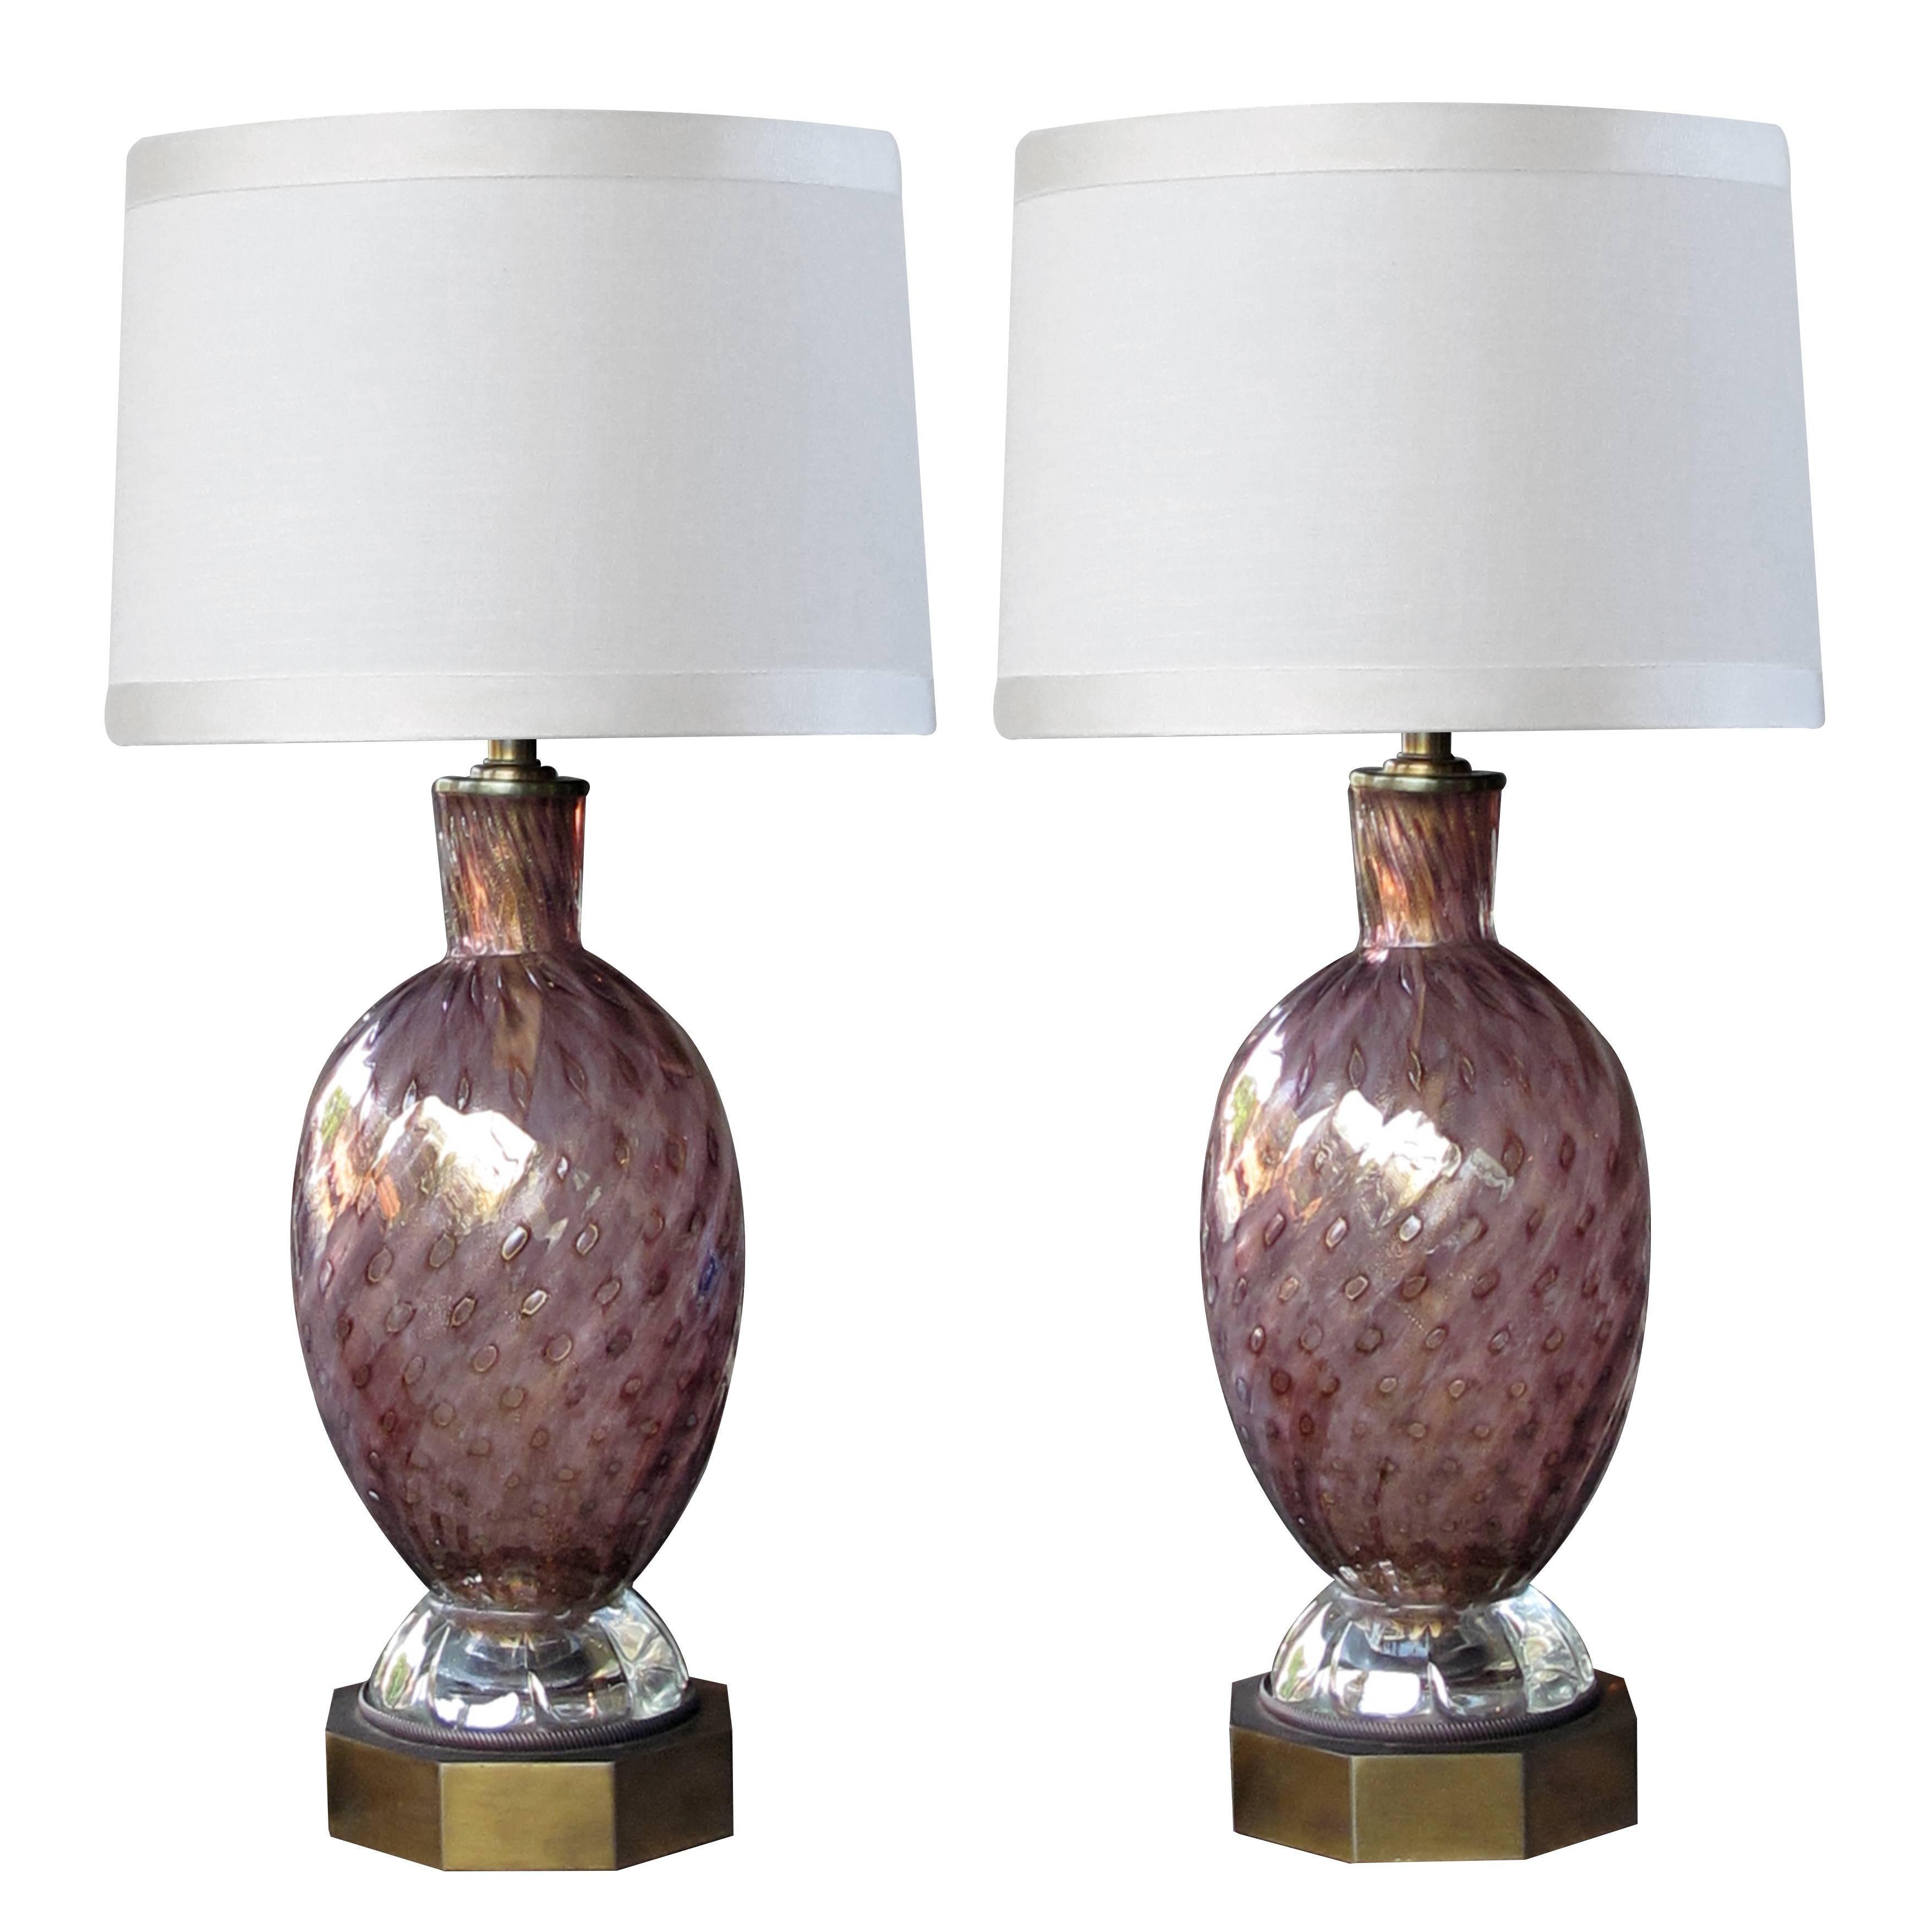 Good Quality Pair of Murano Seguso Midcentury Aubergine Glass Lamps